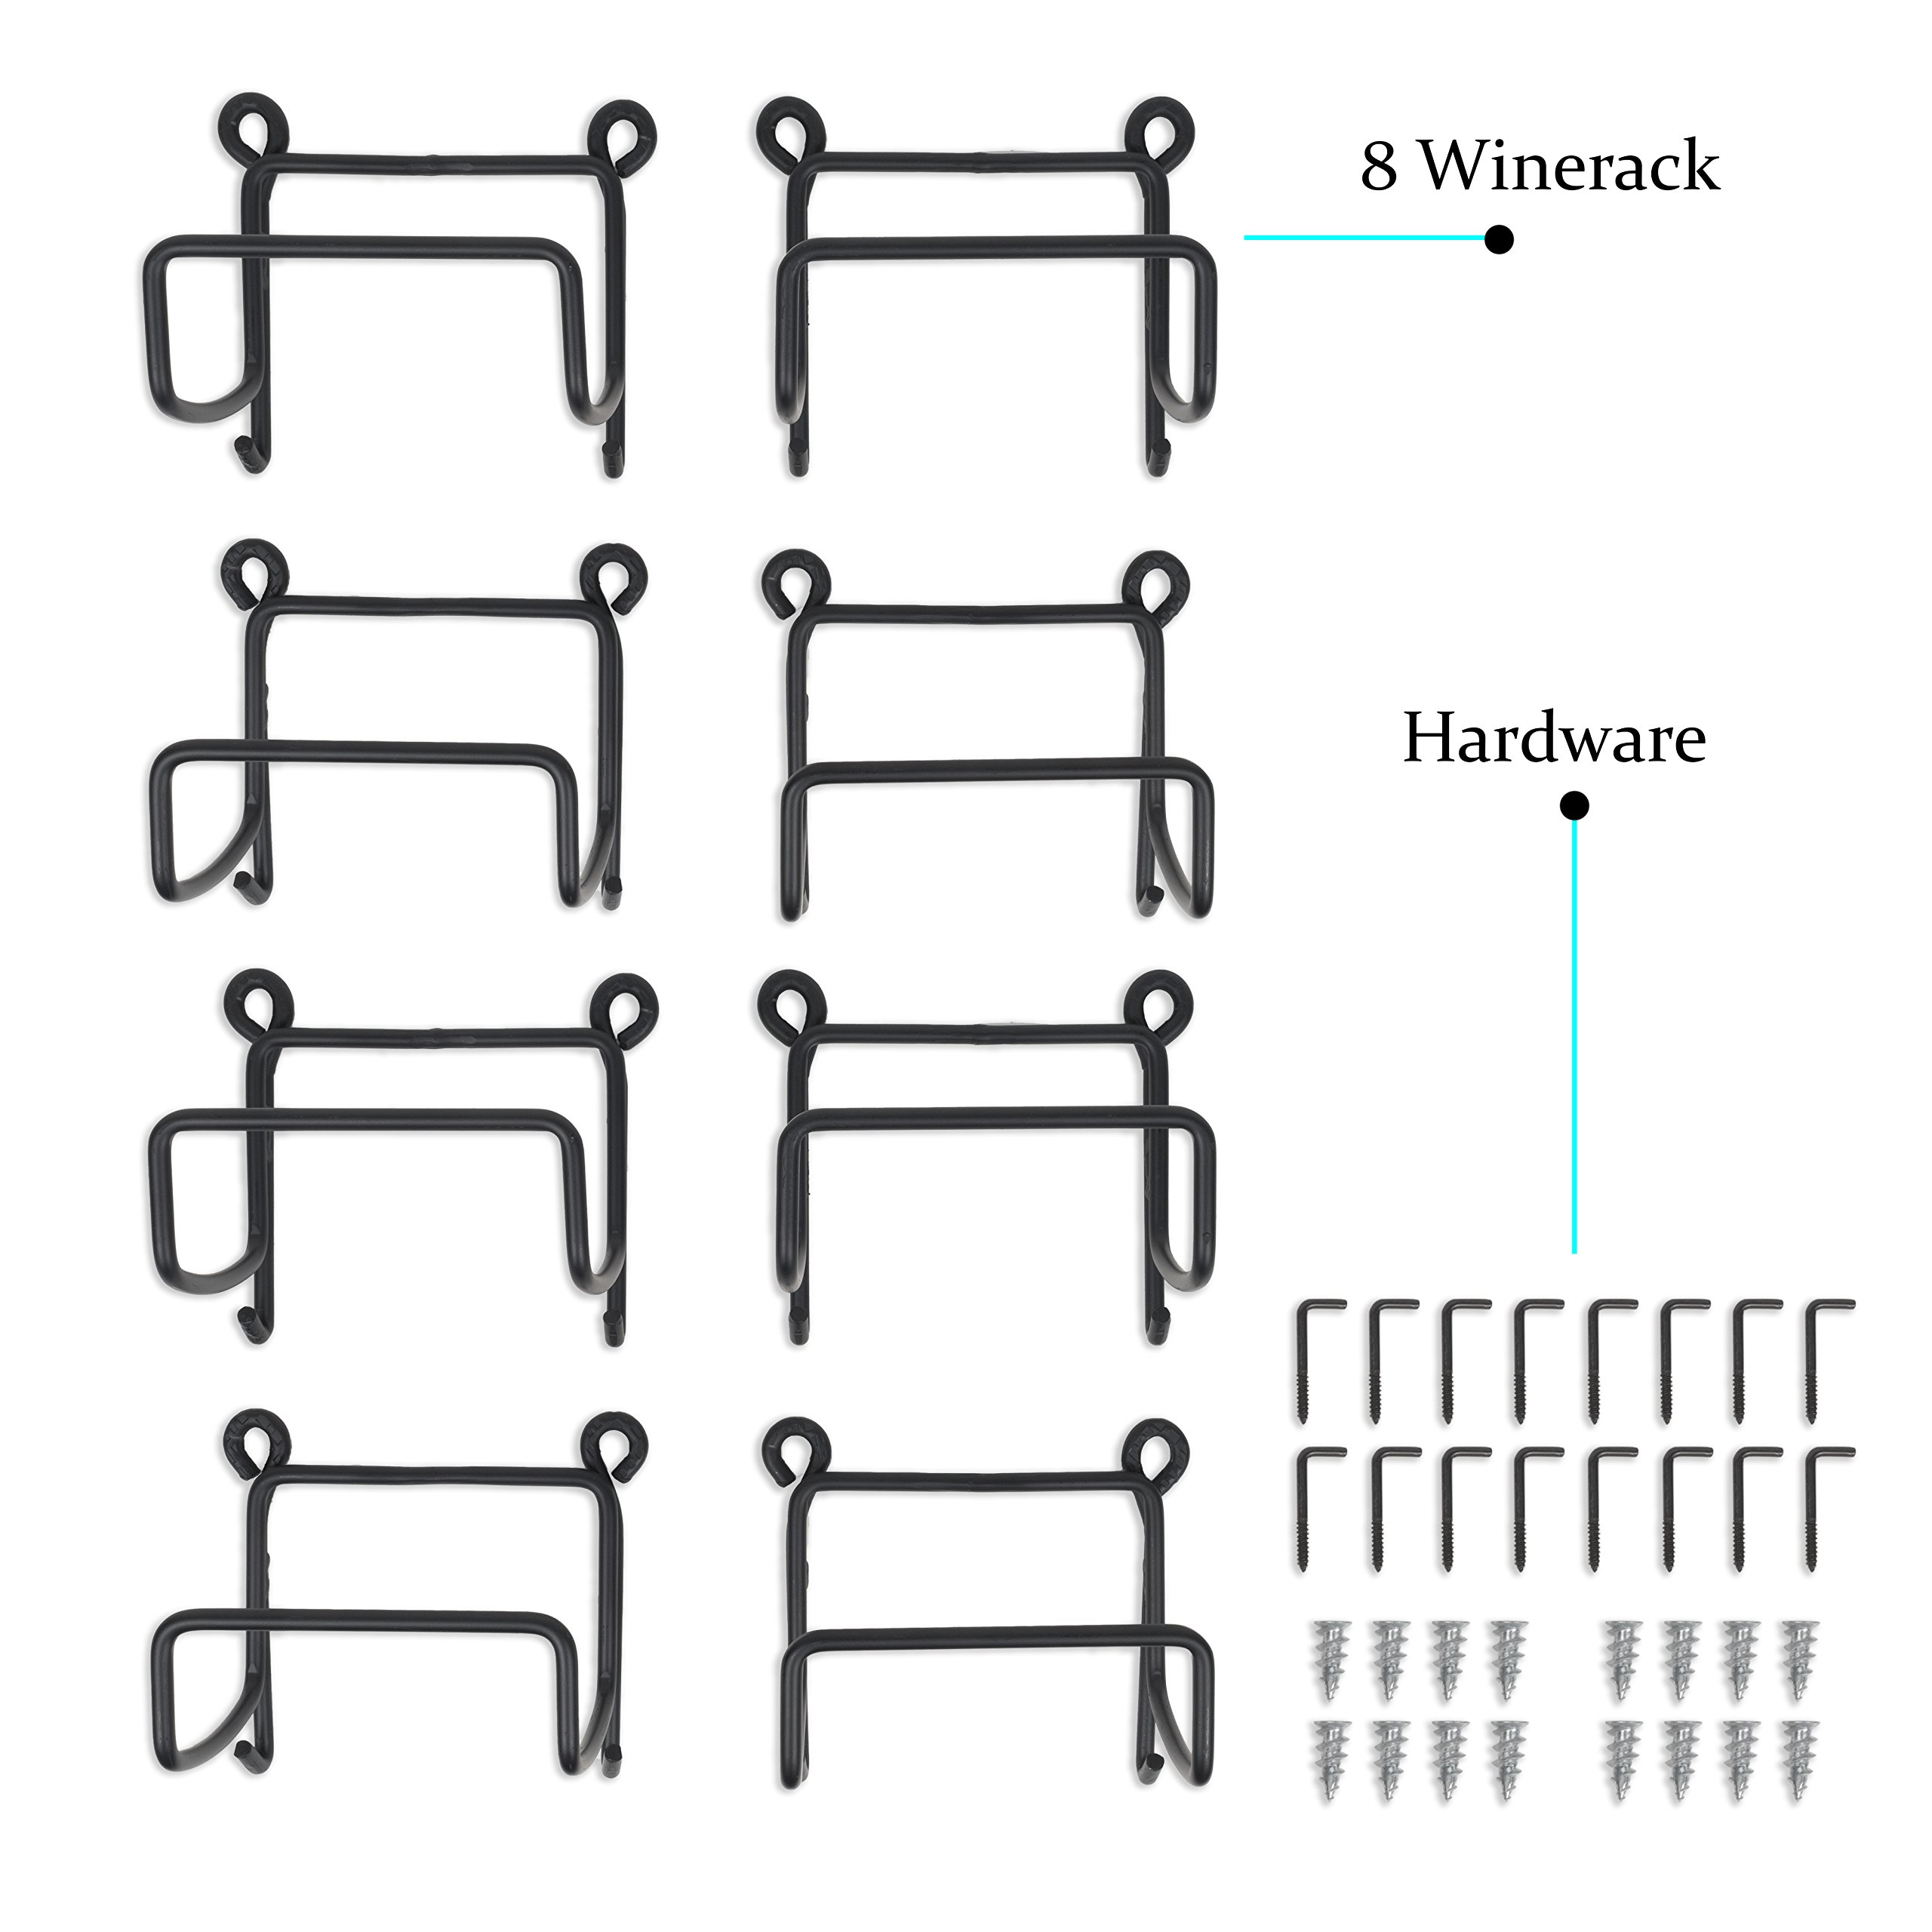 Wallniture Wrought Iron Wine Rack – Wall Mount Bottle Storage Organizer – Rustic Home Decor Black Set of 8 by Wallniture (Image #6)